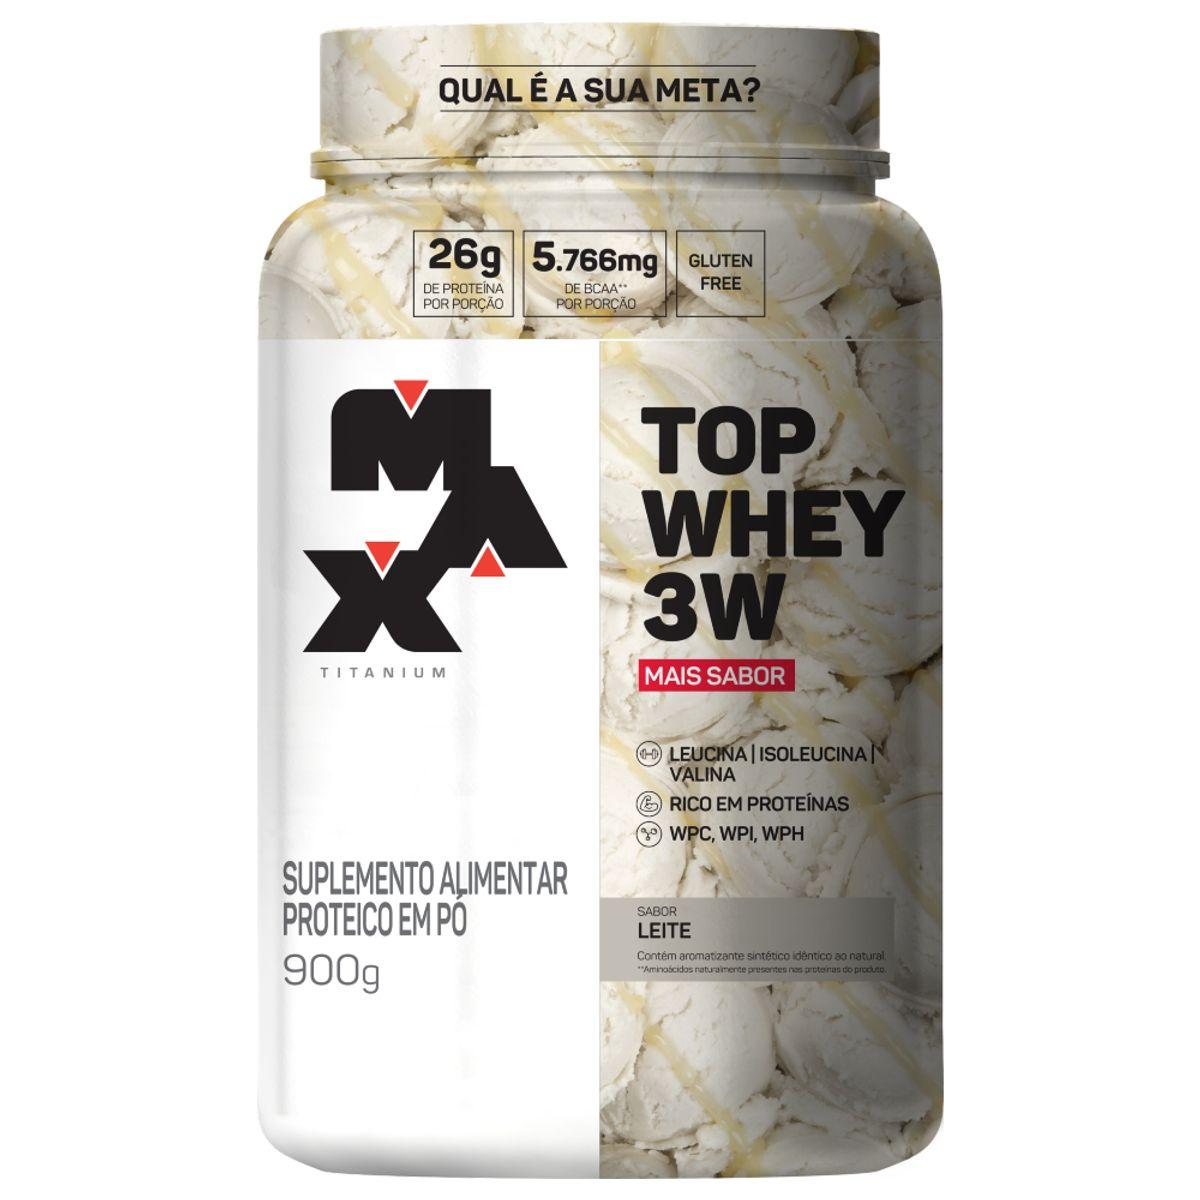 Top Whey 3W Mais Sabor 900g Max Titanium